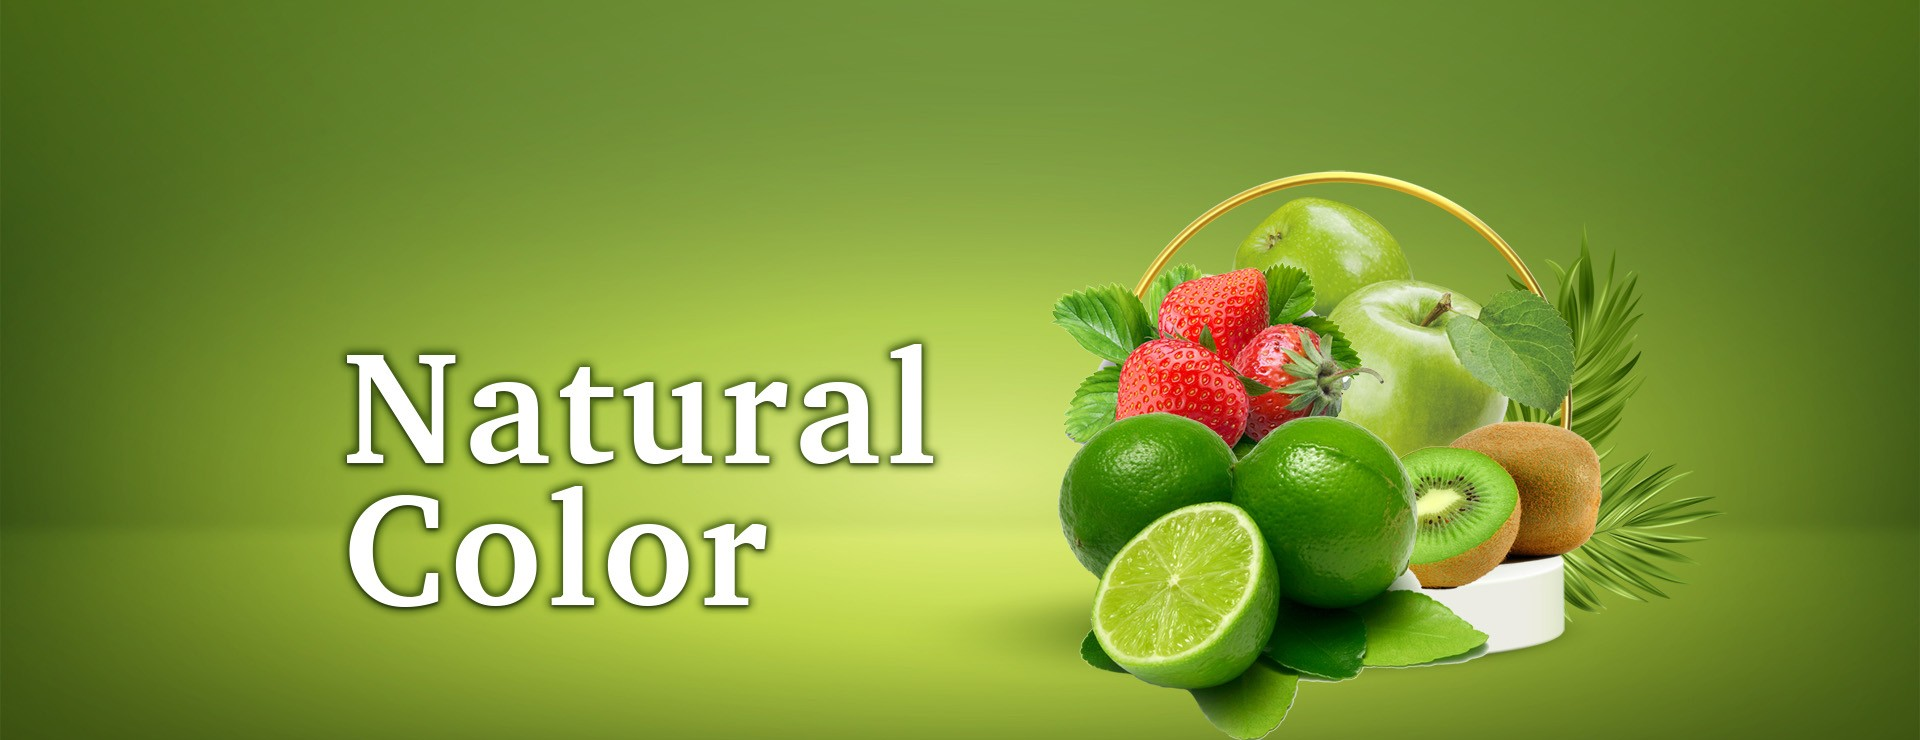 Natural Coloring